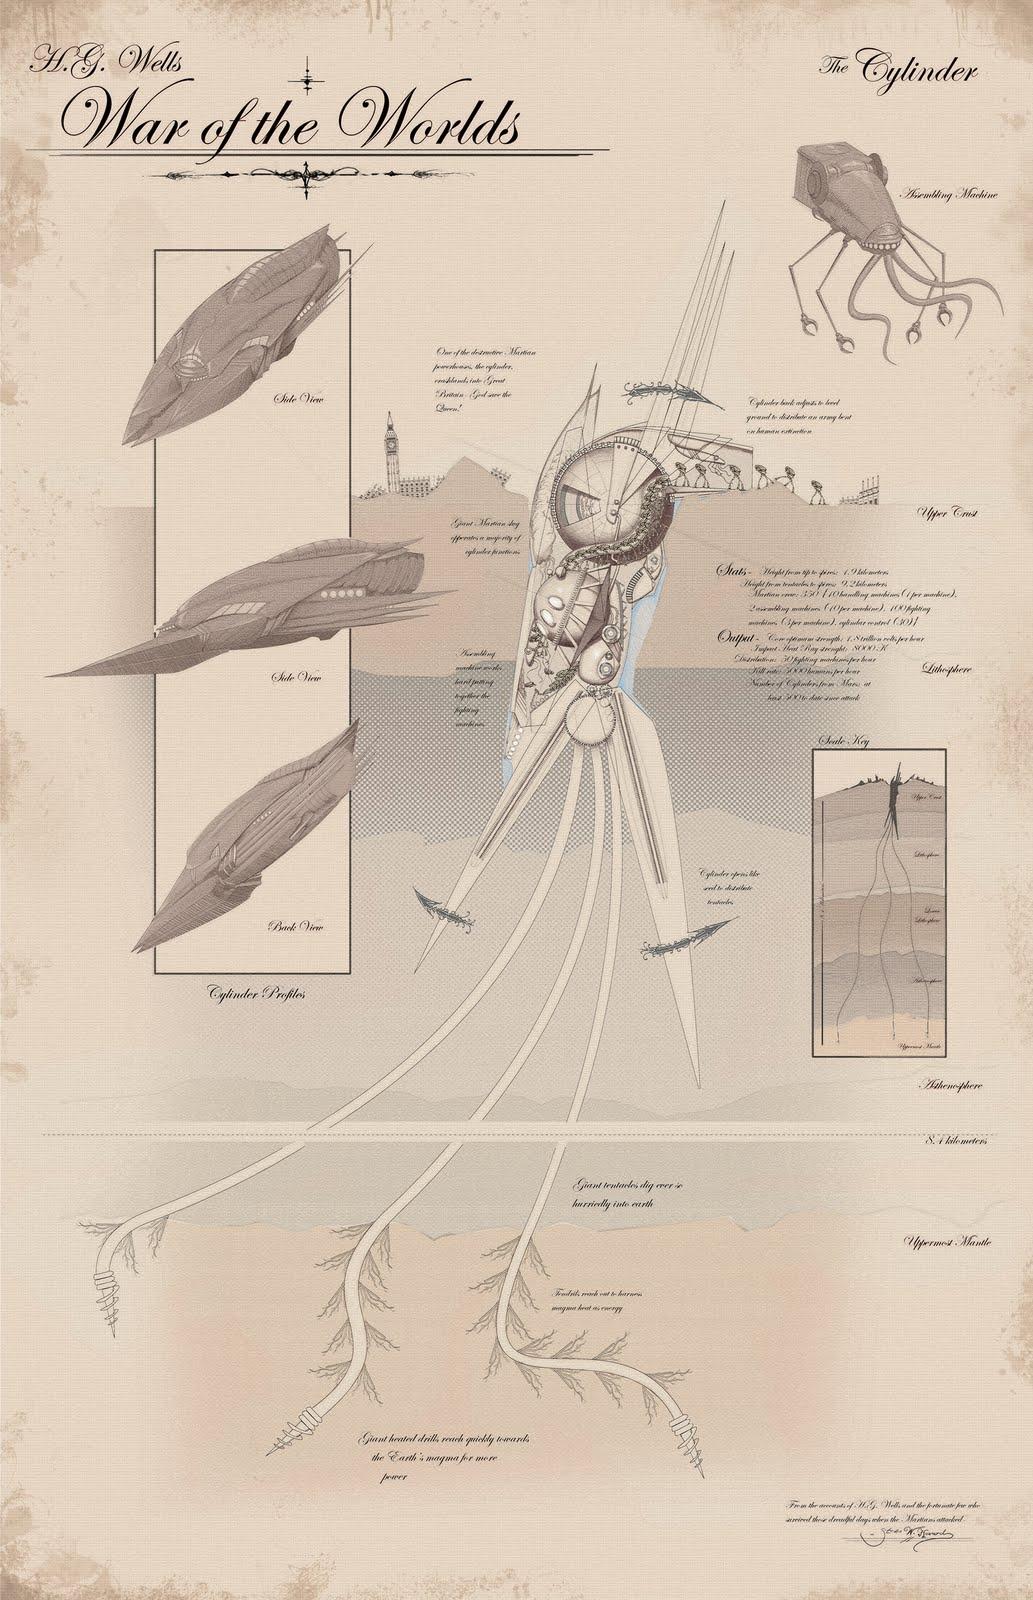 Martian Cylinder by Berty-J-A on DeviantArt